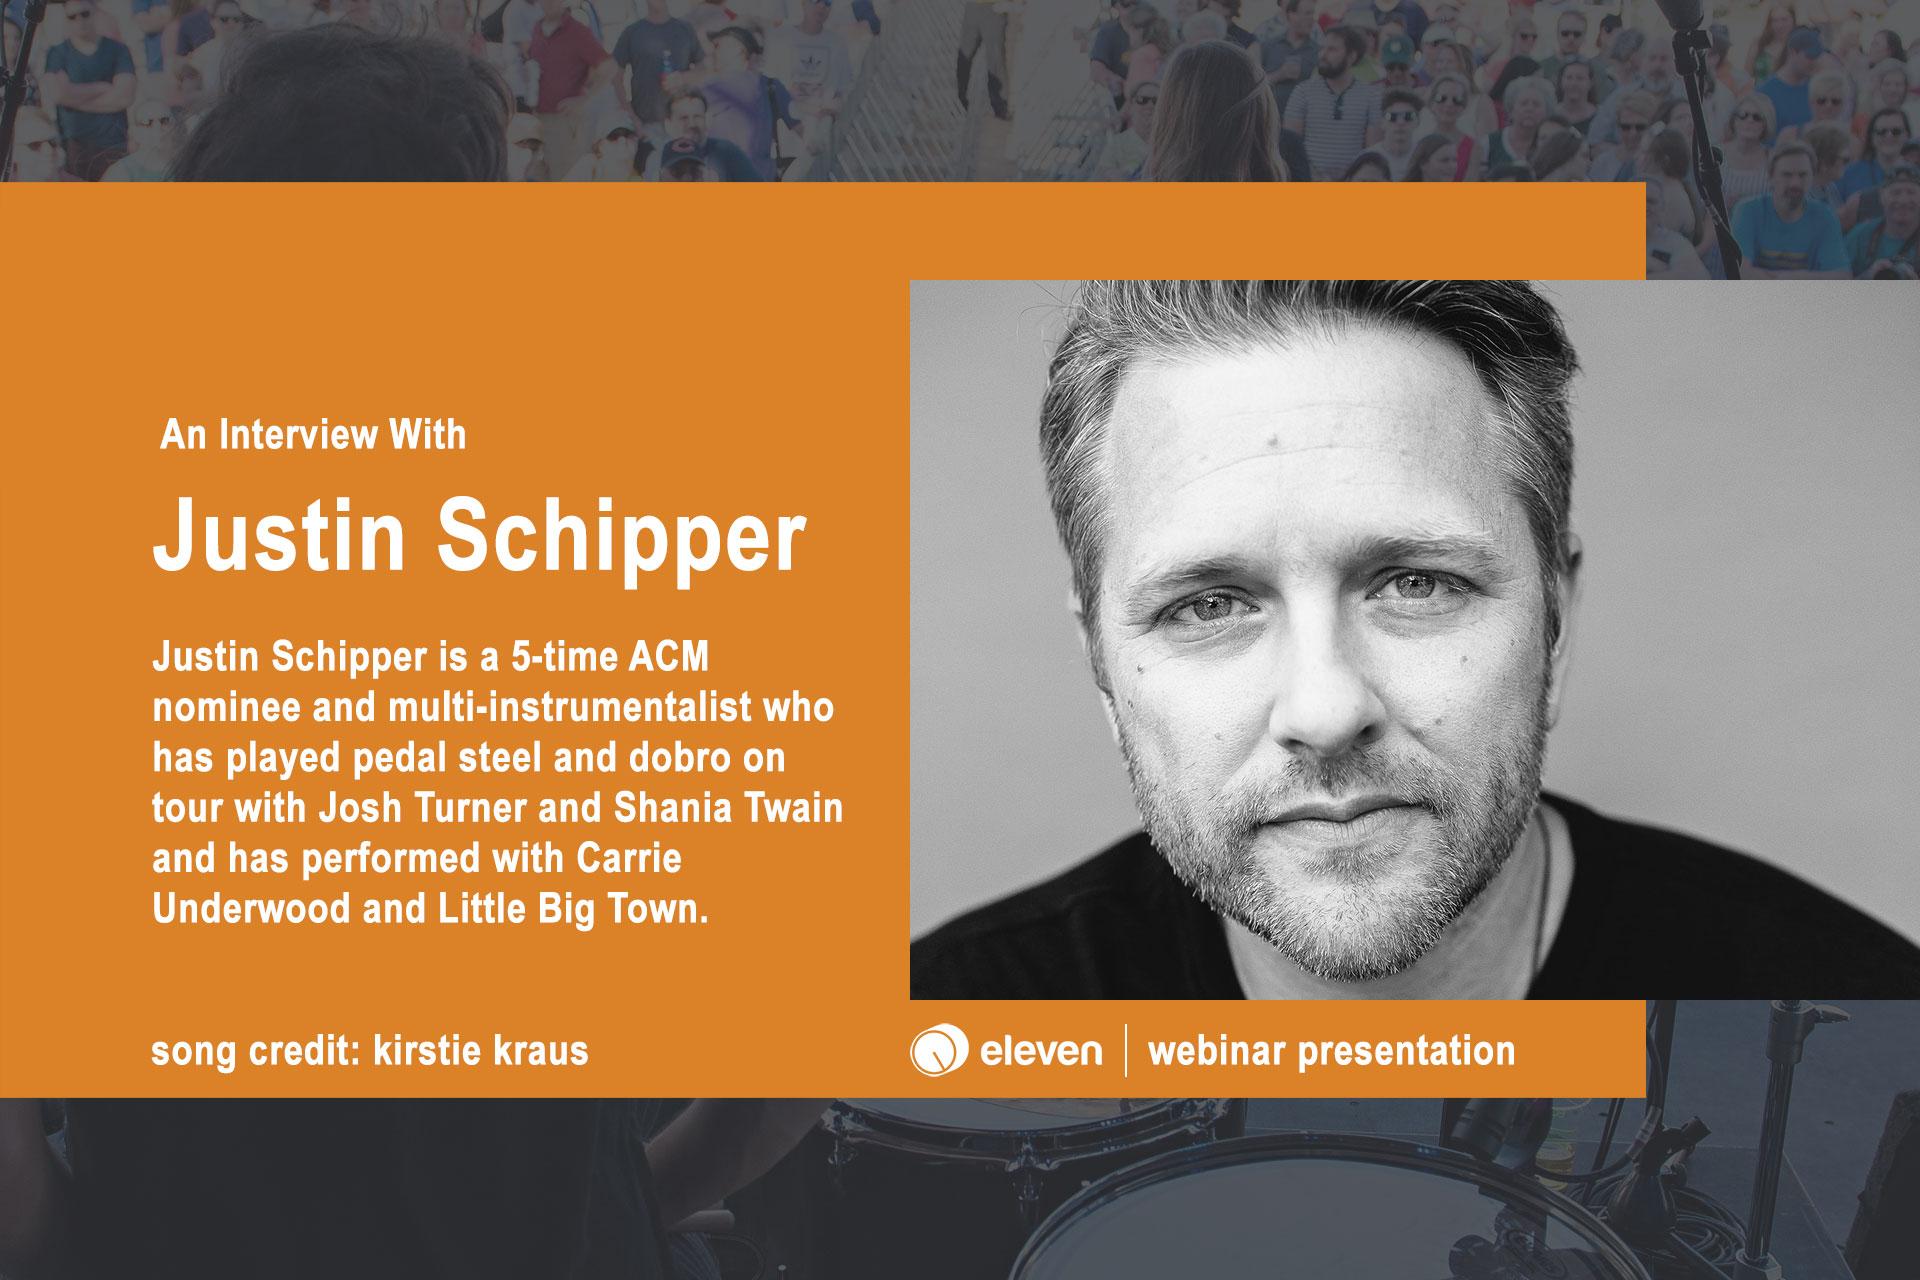 An Interview with Justin Schipper